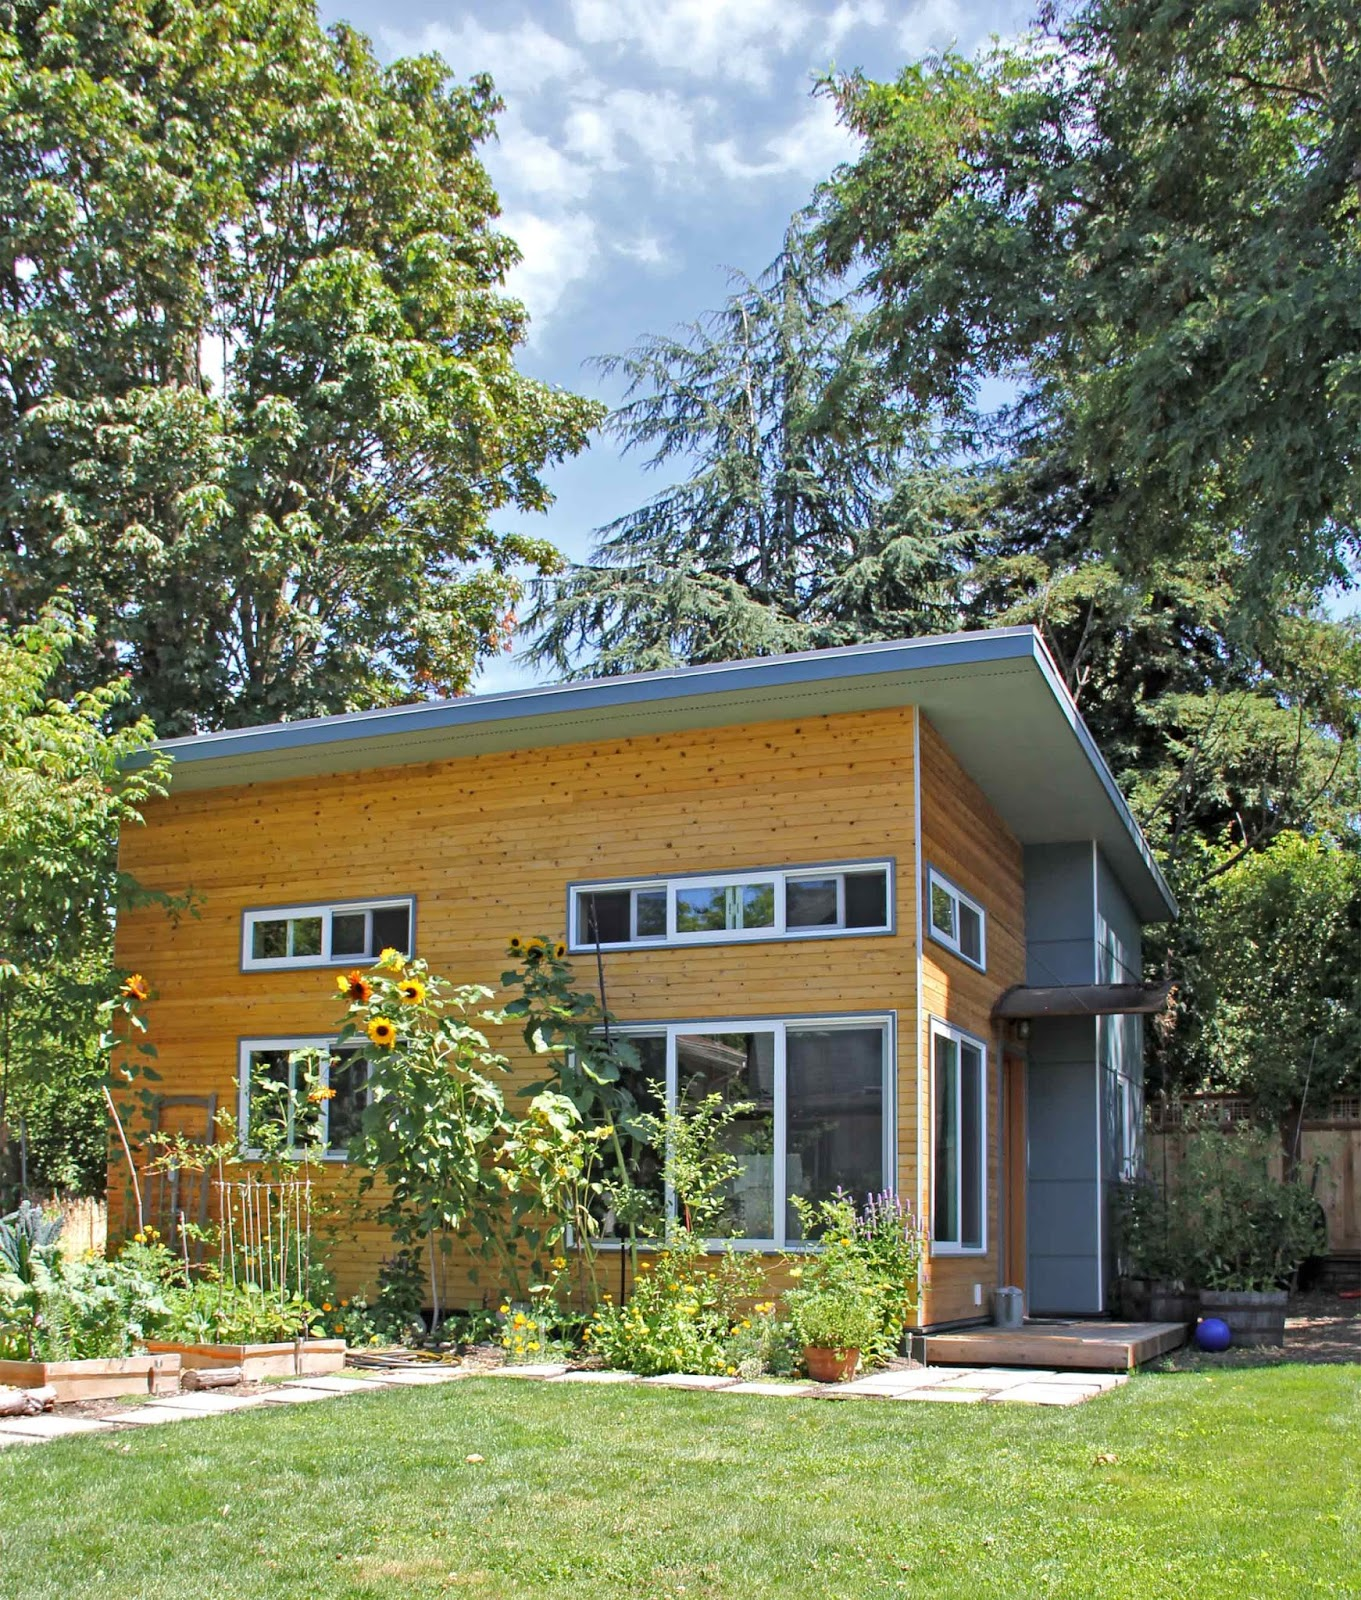 Backyard Cottage Blog: Capitol Hill Cottage